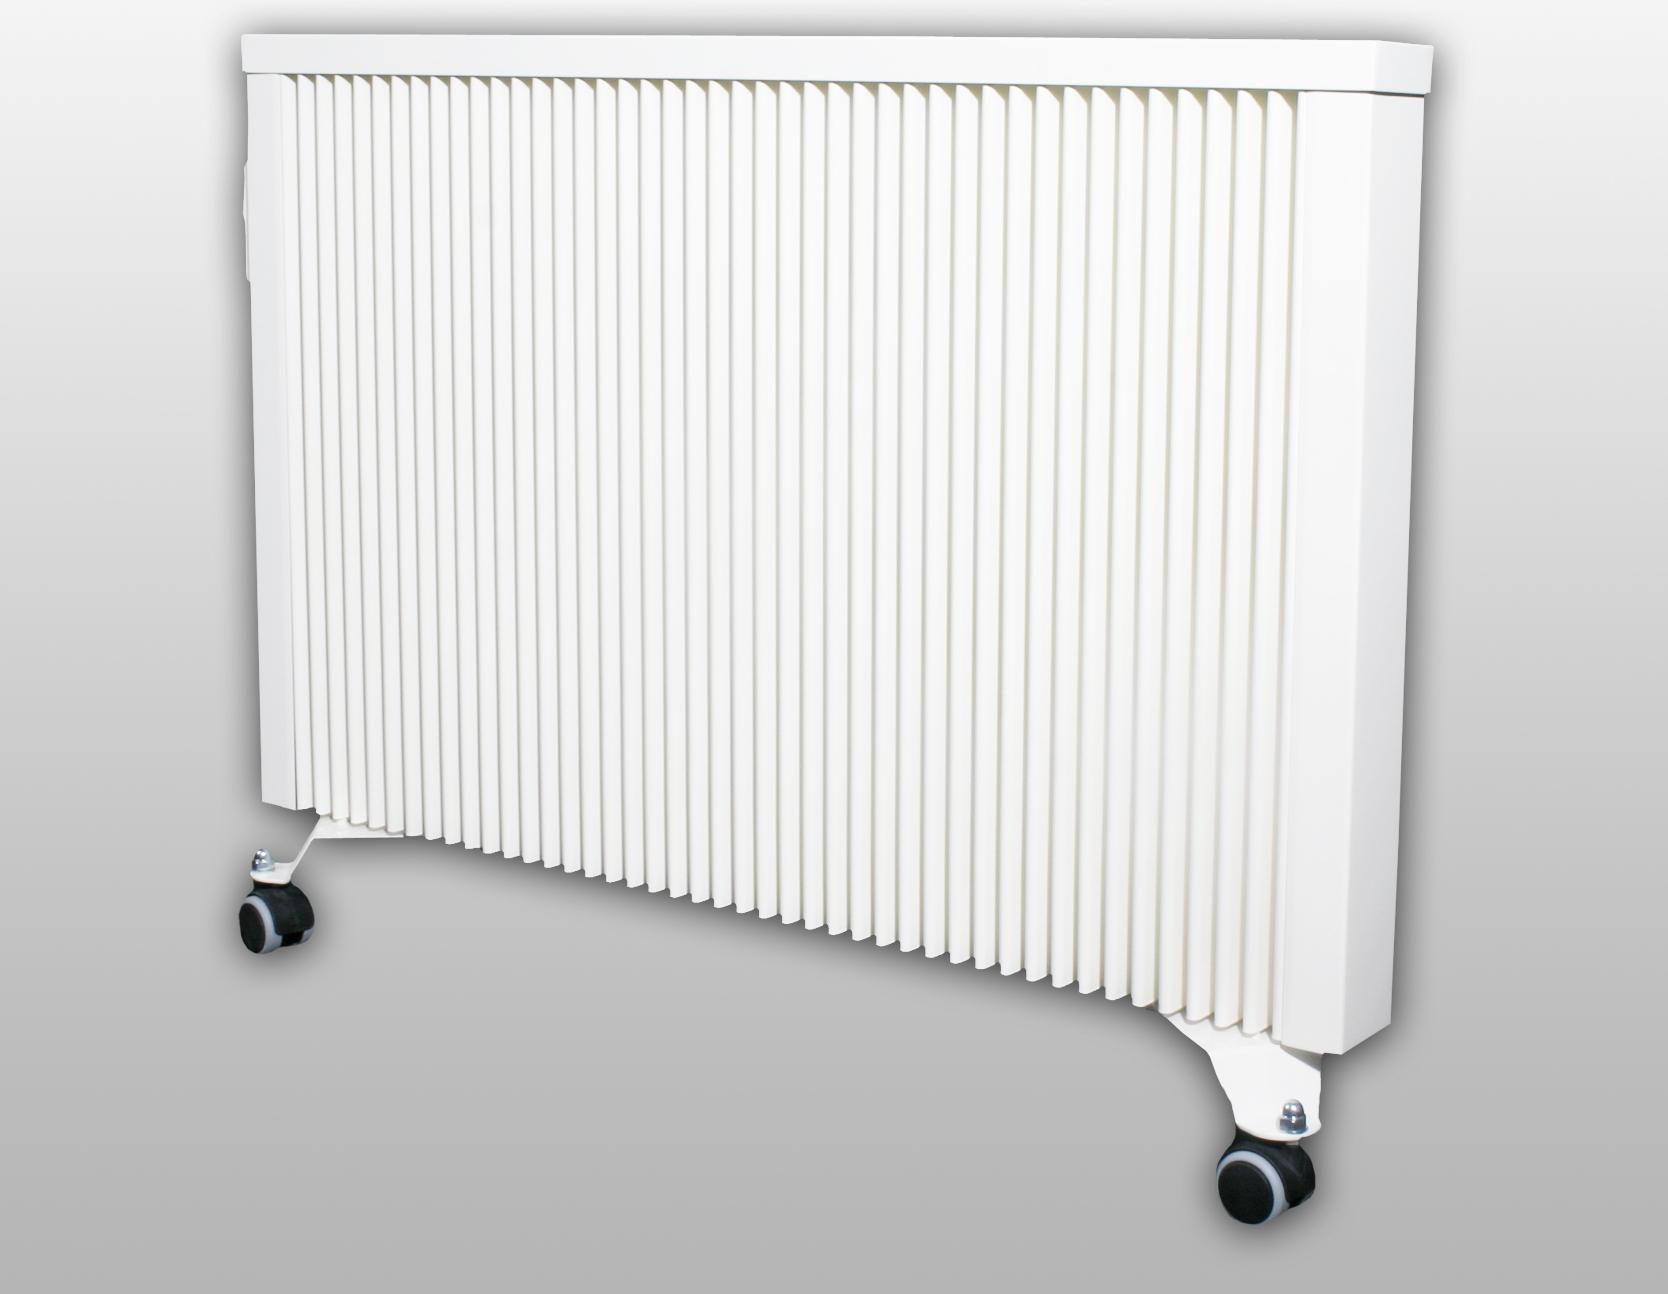 Topný panel série H, TYP H251, 2500 W